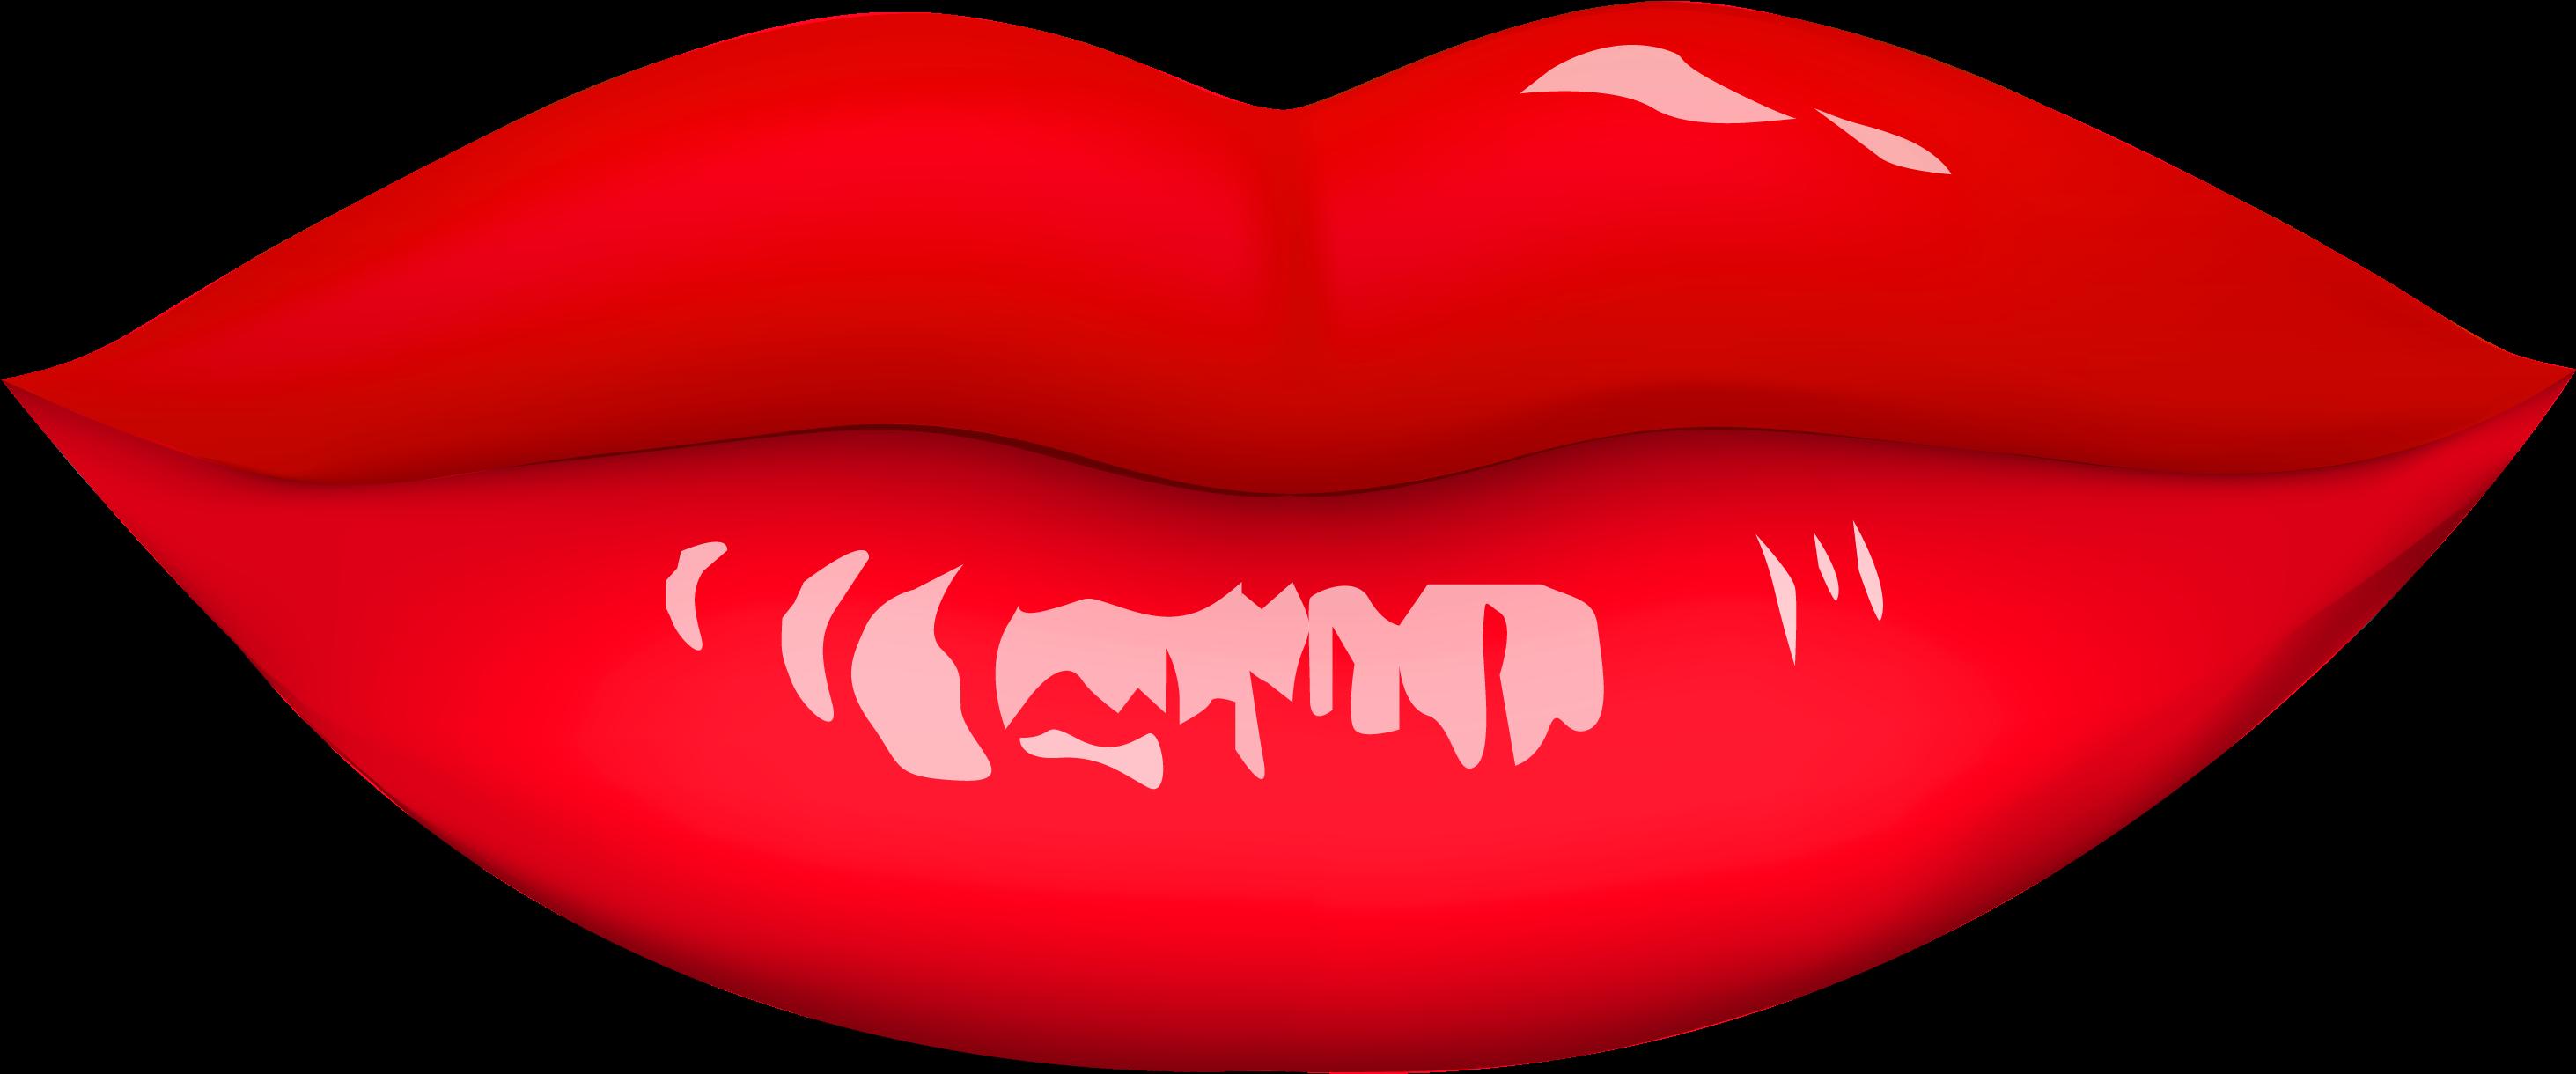 Lips clipart pretty lip. Beautiful png download full